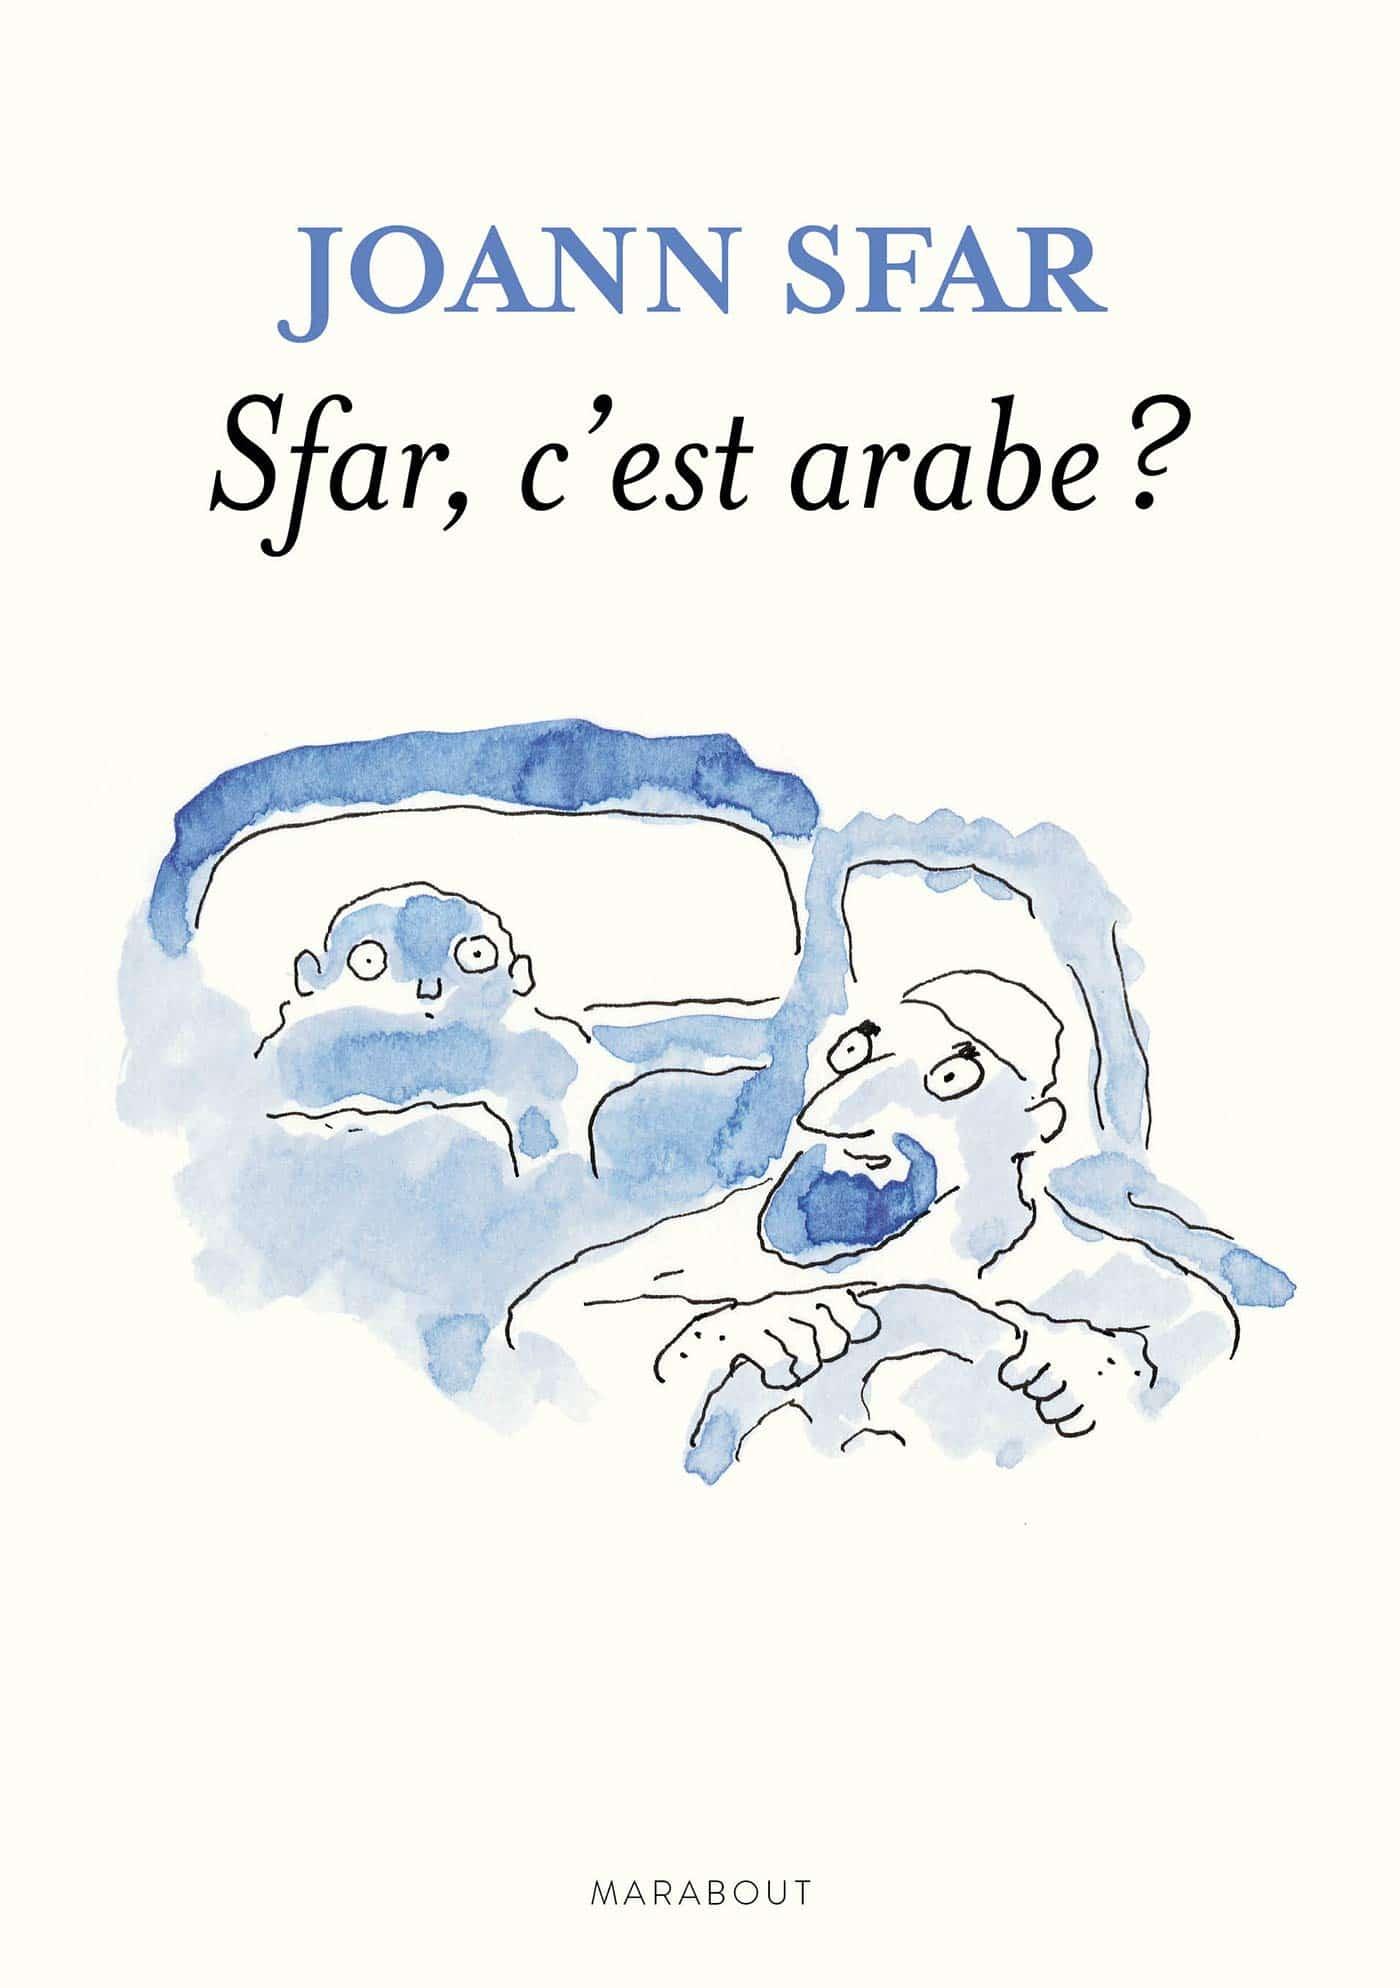 Sfar, c'est arabe ? Le chemin de Joann